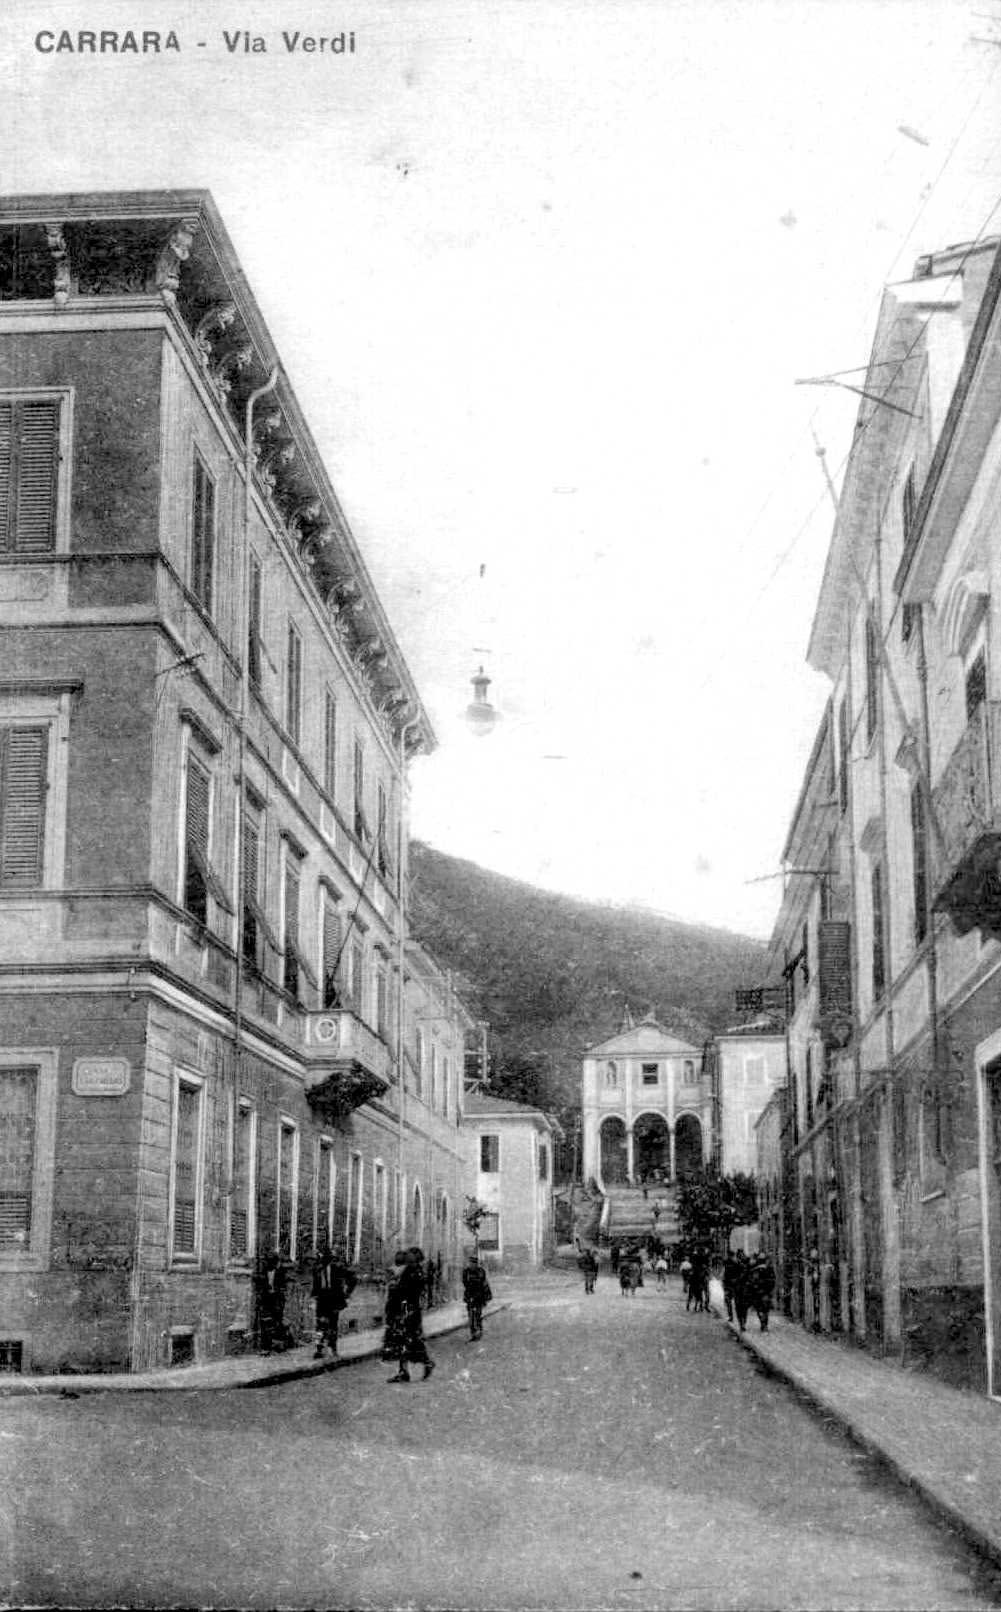 cb via Verdi ang. via Cucchiari